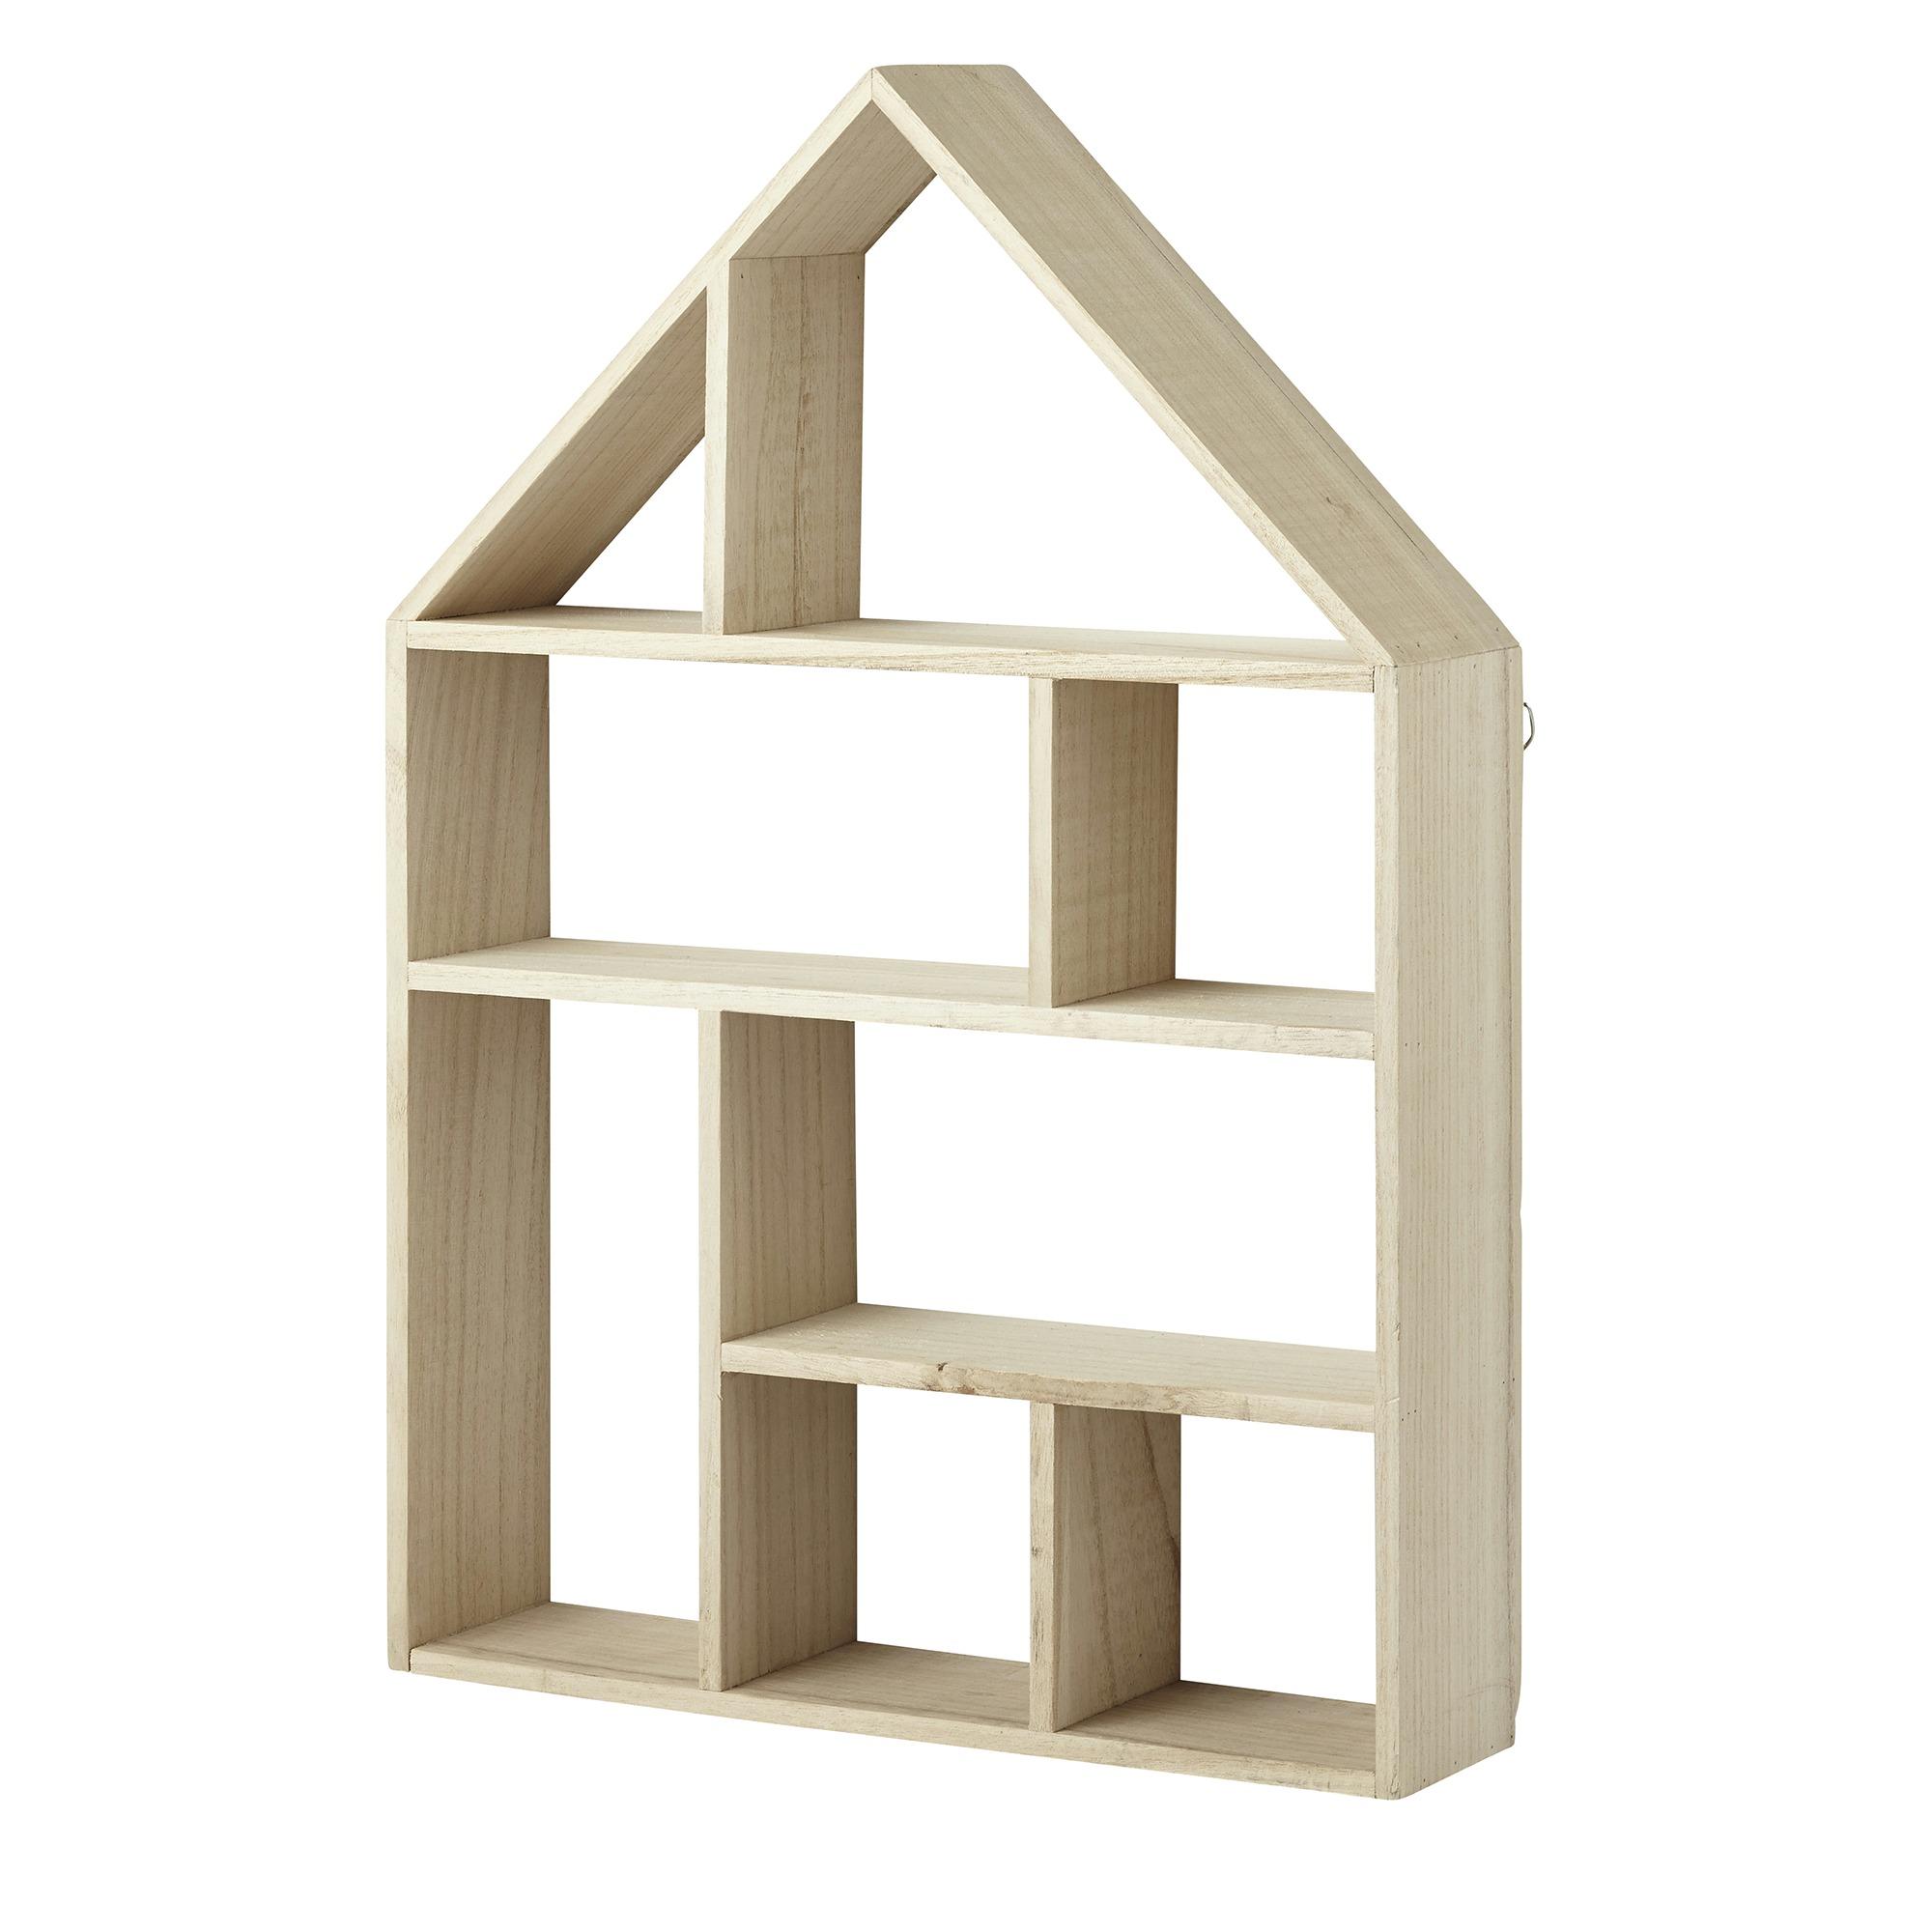 Letterbak hout huis 50x8 5x35 cm overige woonaccessoires woonaccessoires meubelen gamma for Hout huis